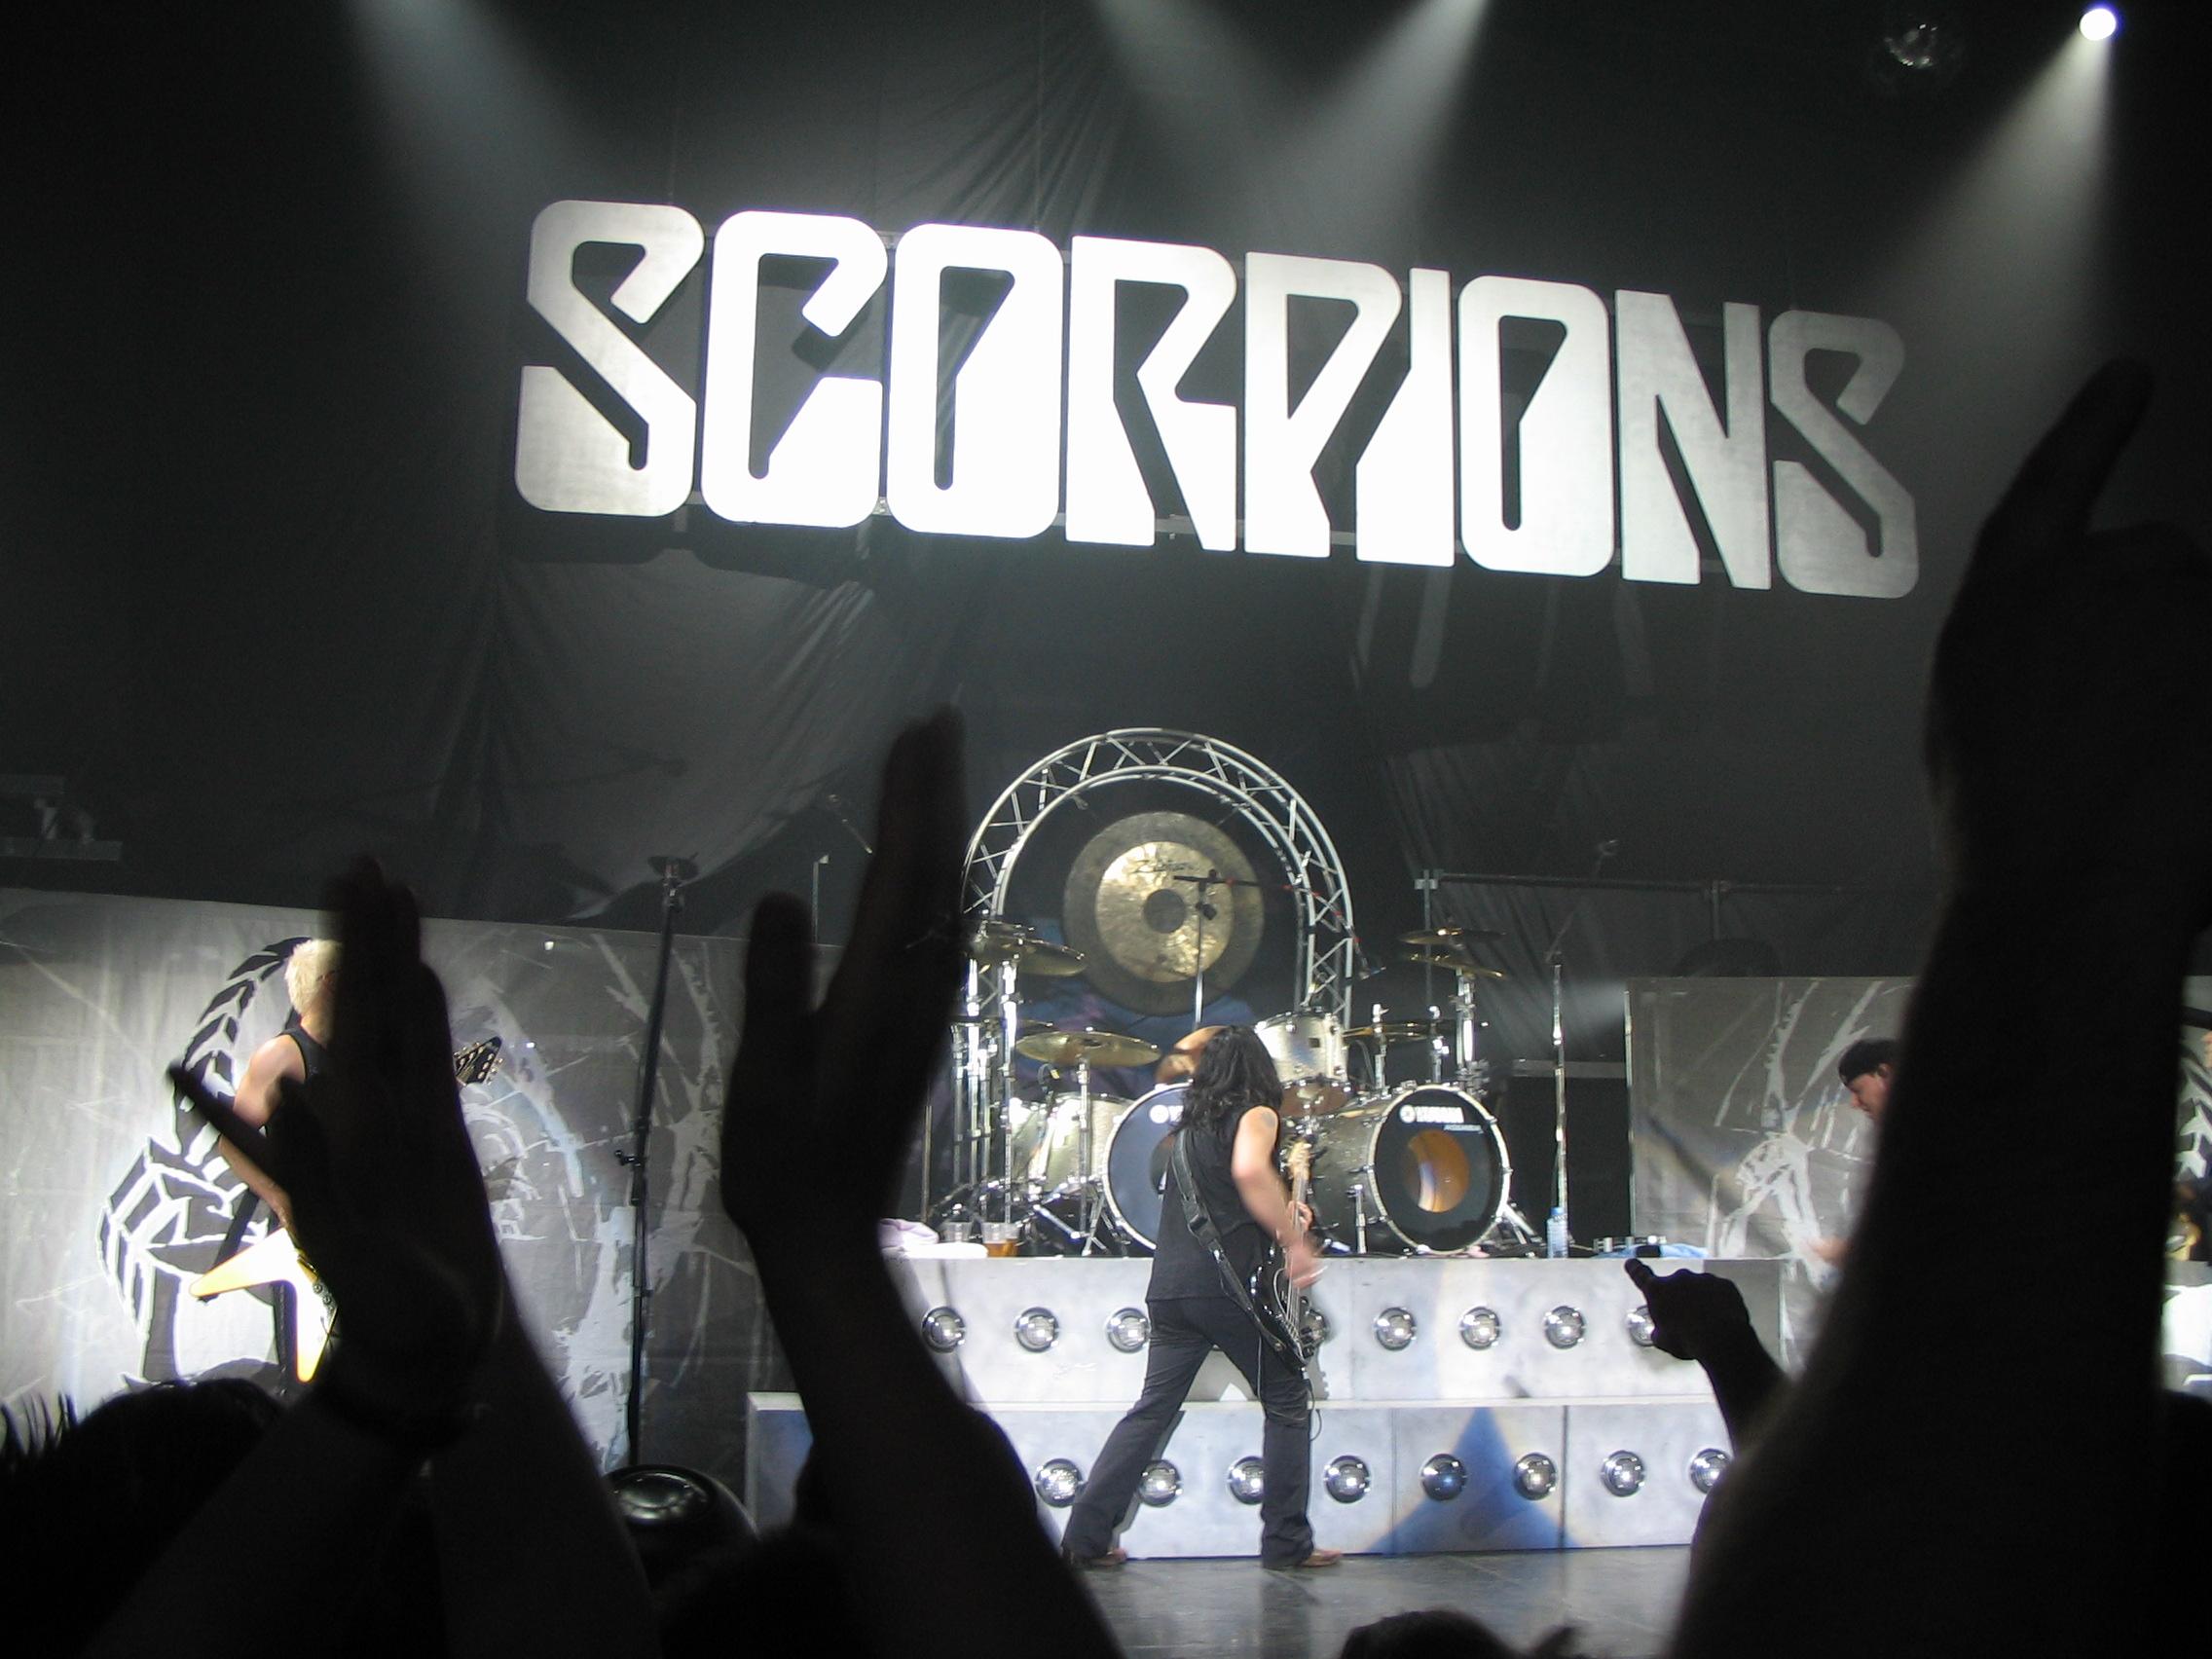 The animals band logo scorpions band logo - Scorpions 29